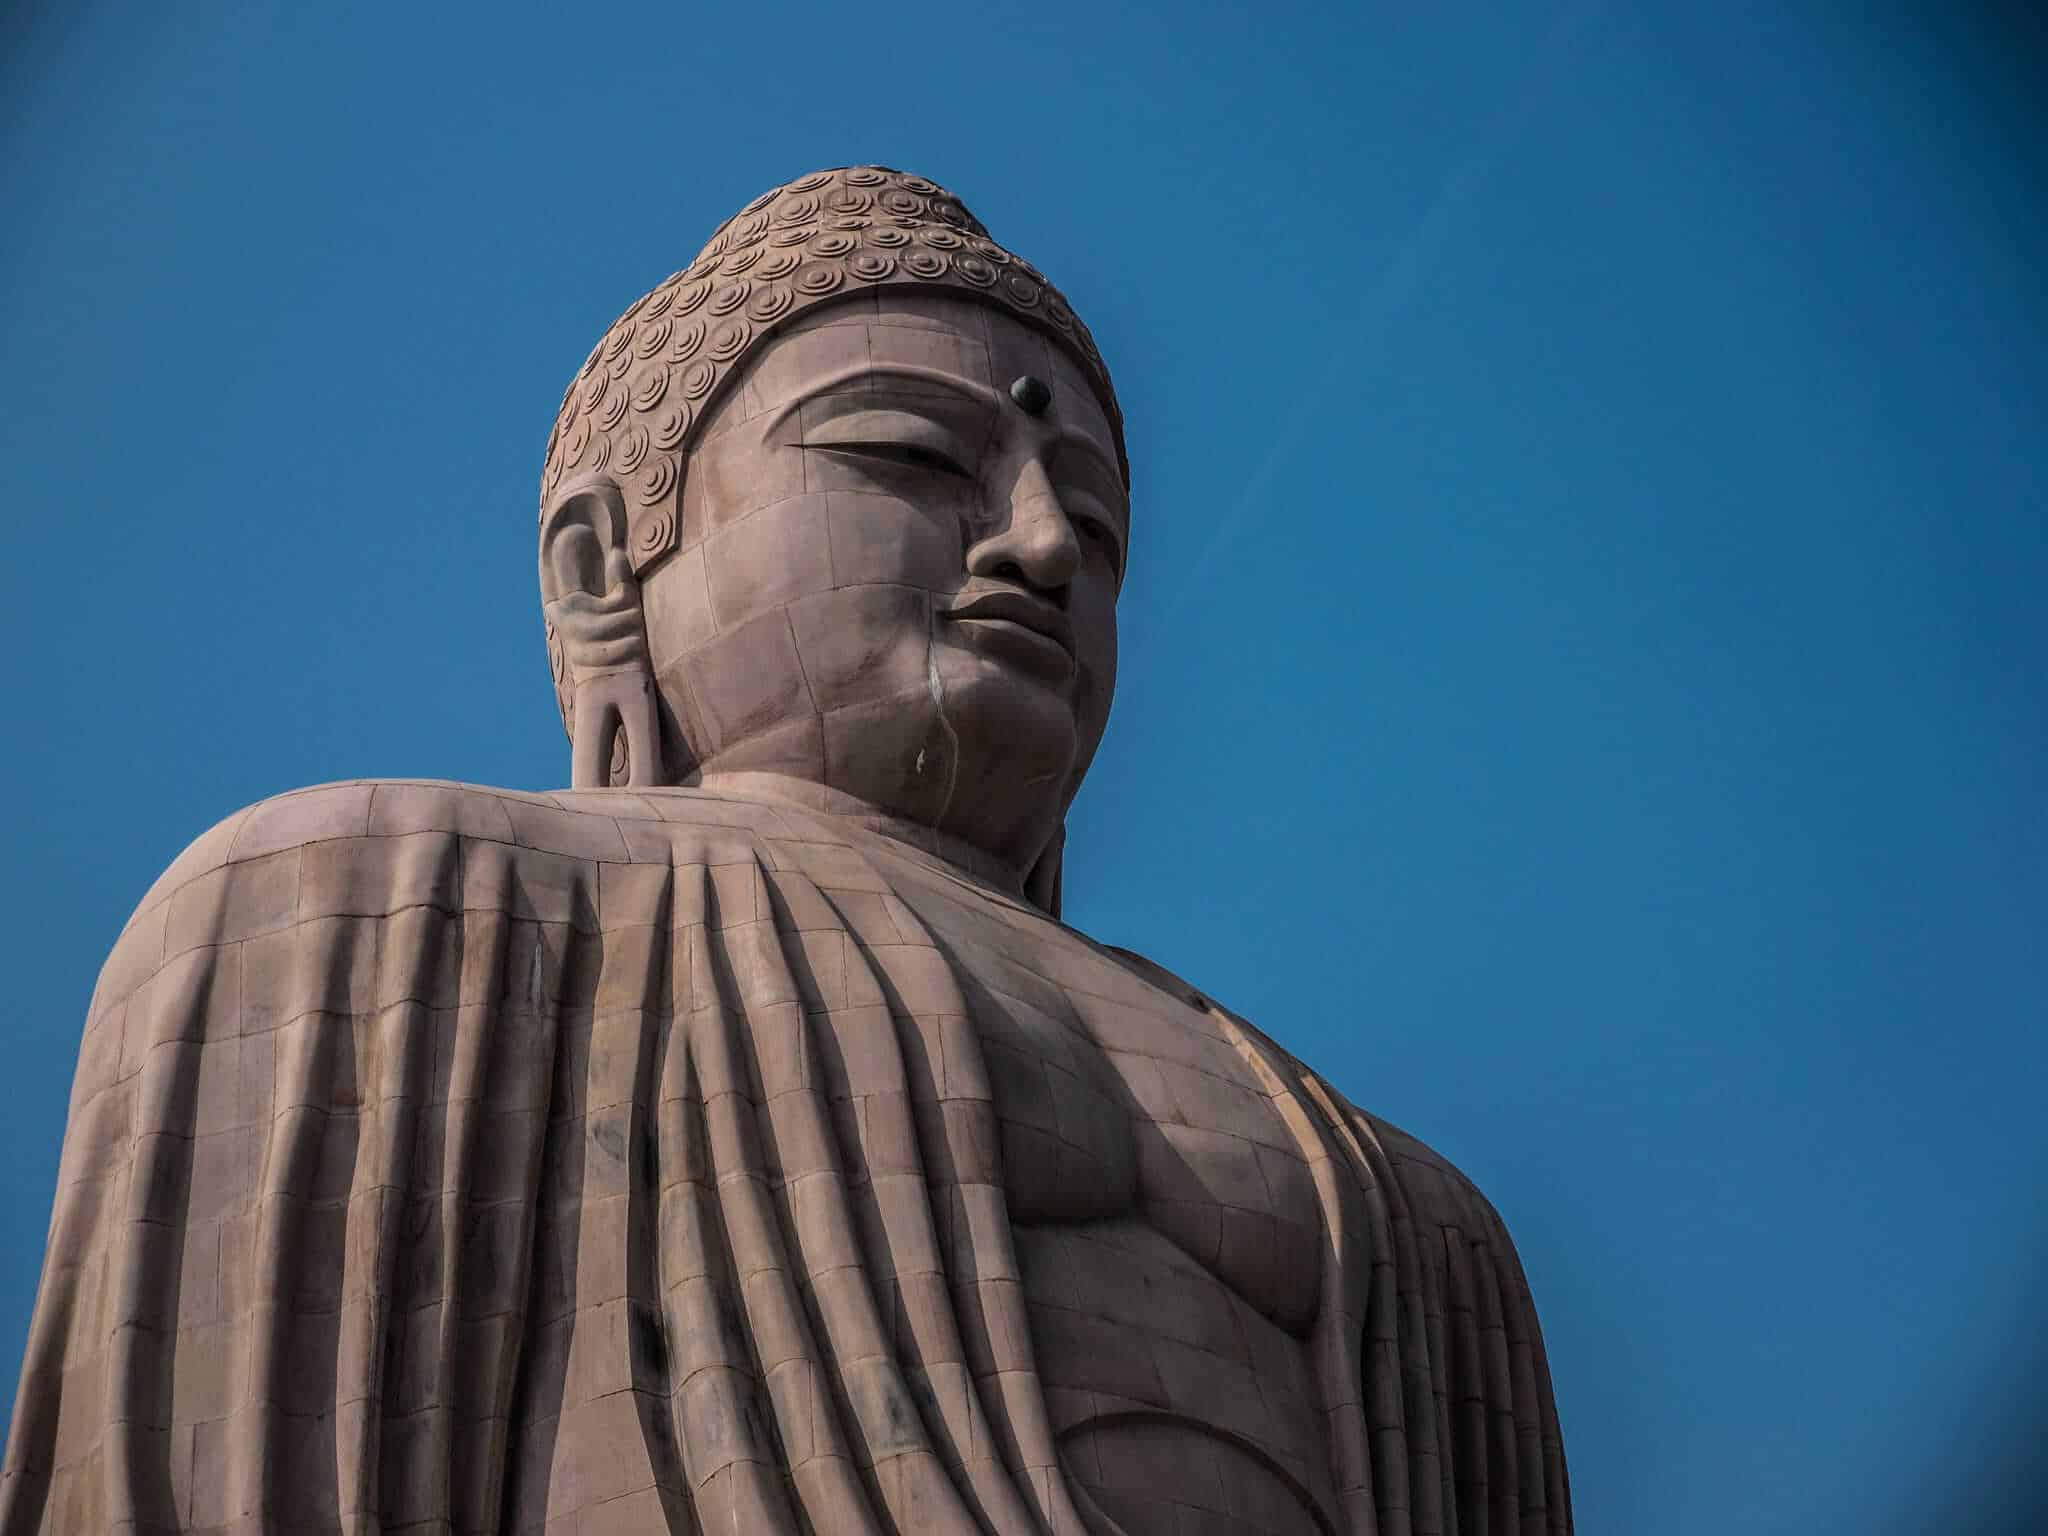 Great Buddha Statue at Bodh Gaya, Bihar, India